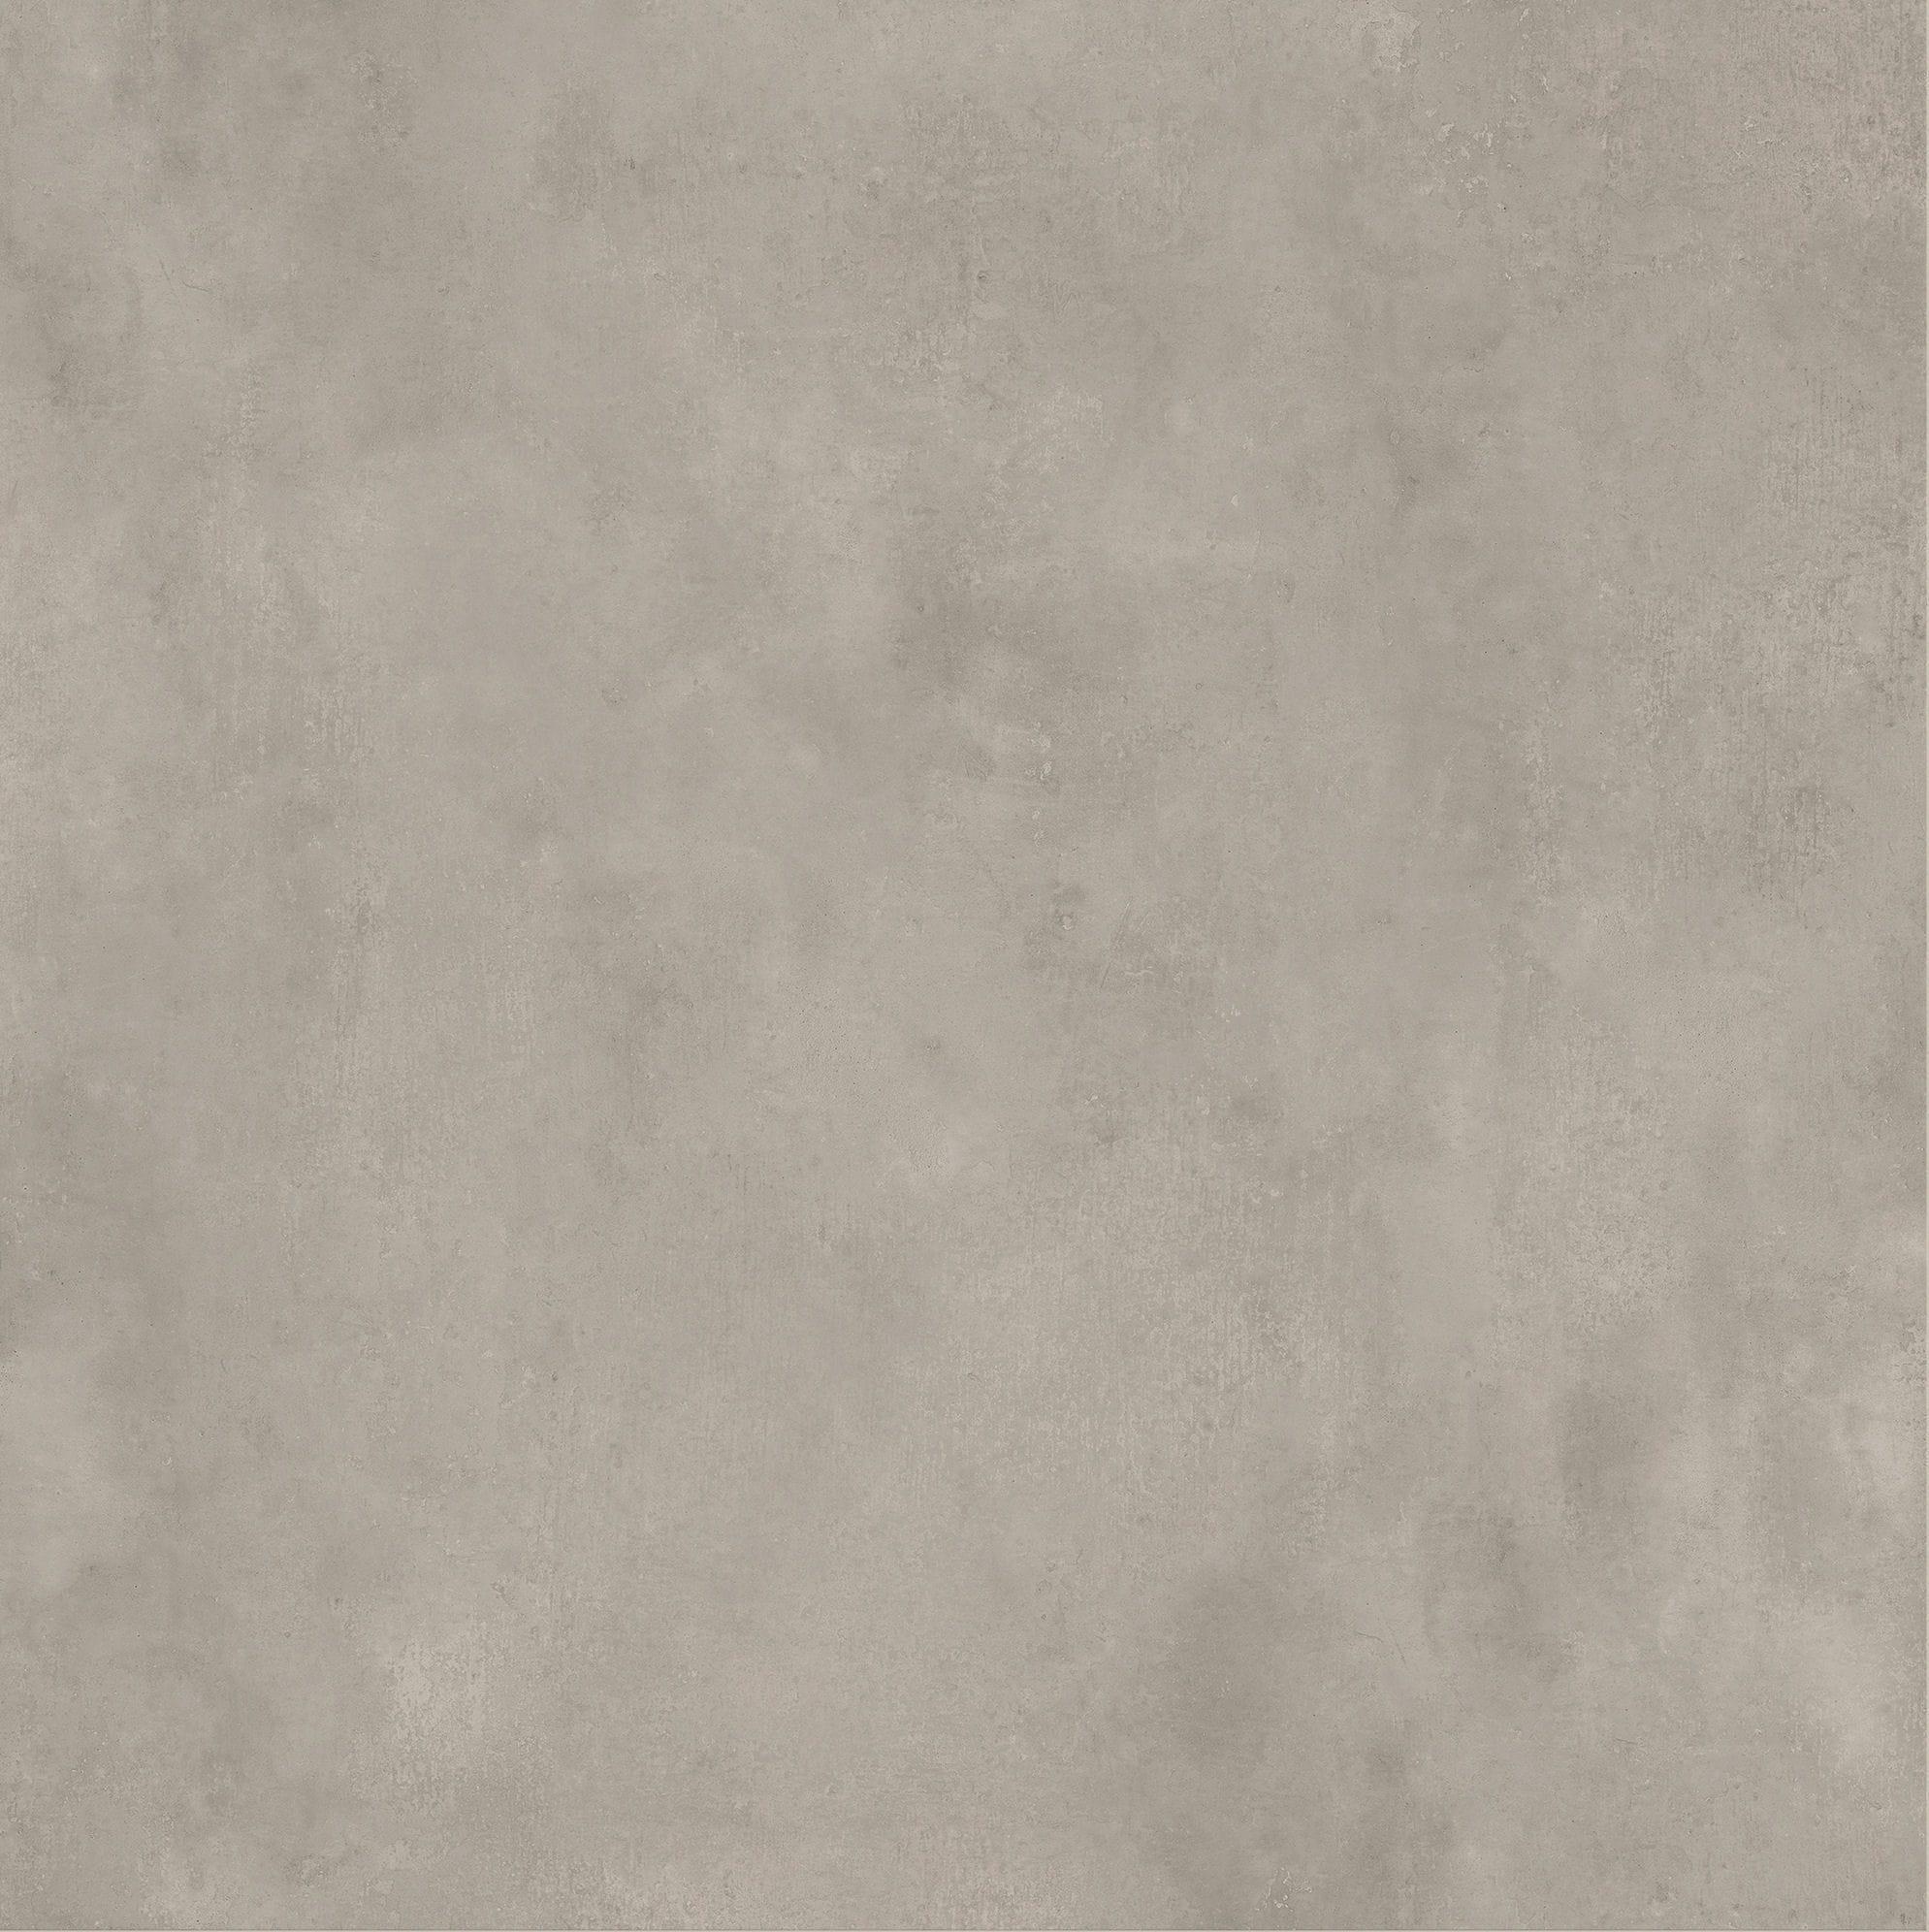 Cemento Light Grey Polished Porcelain Tiles Mandarin Stone